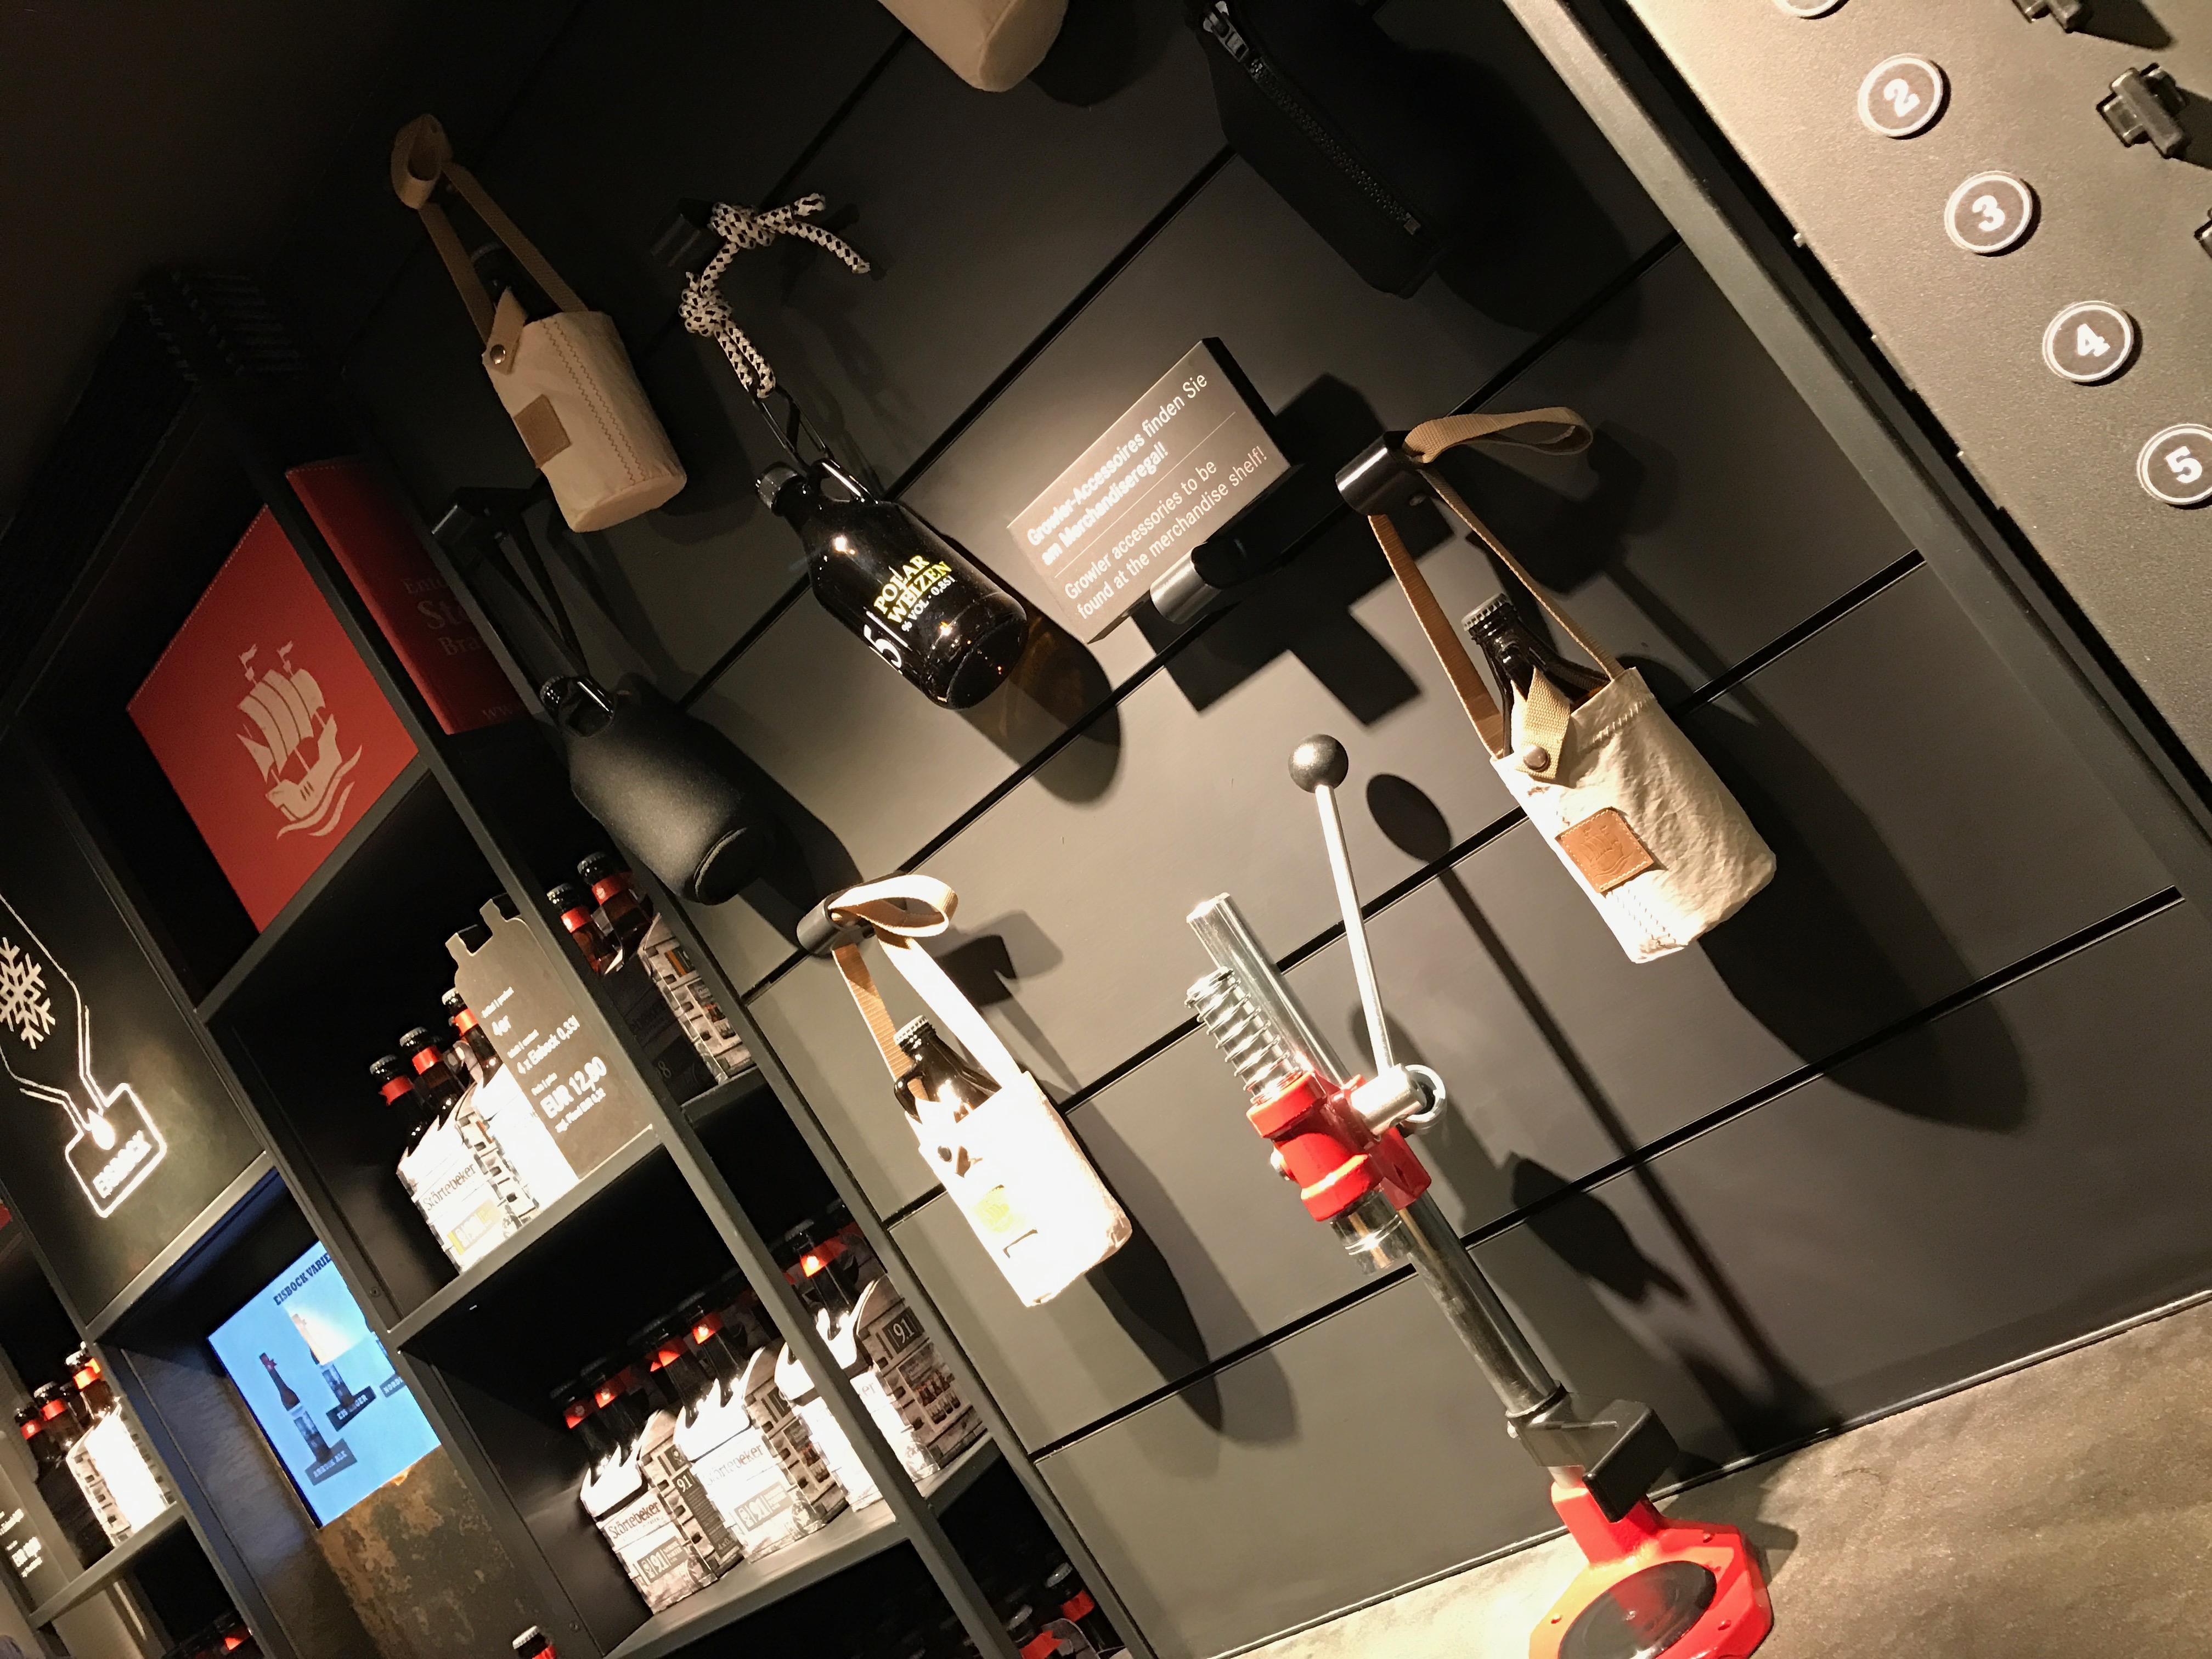 Störtebeker-Gastronomie: Taste & Shop